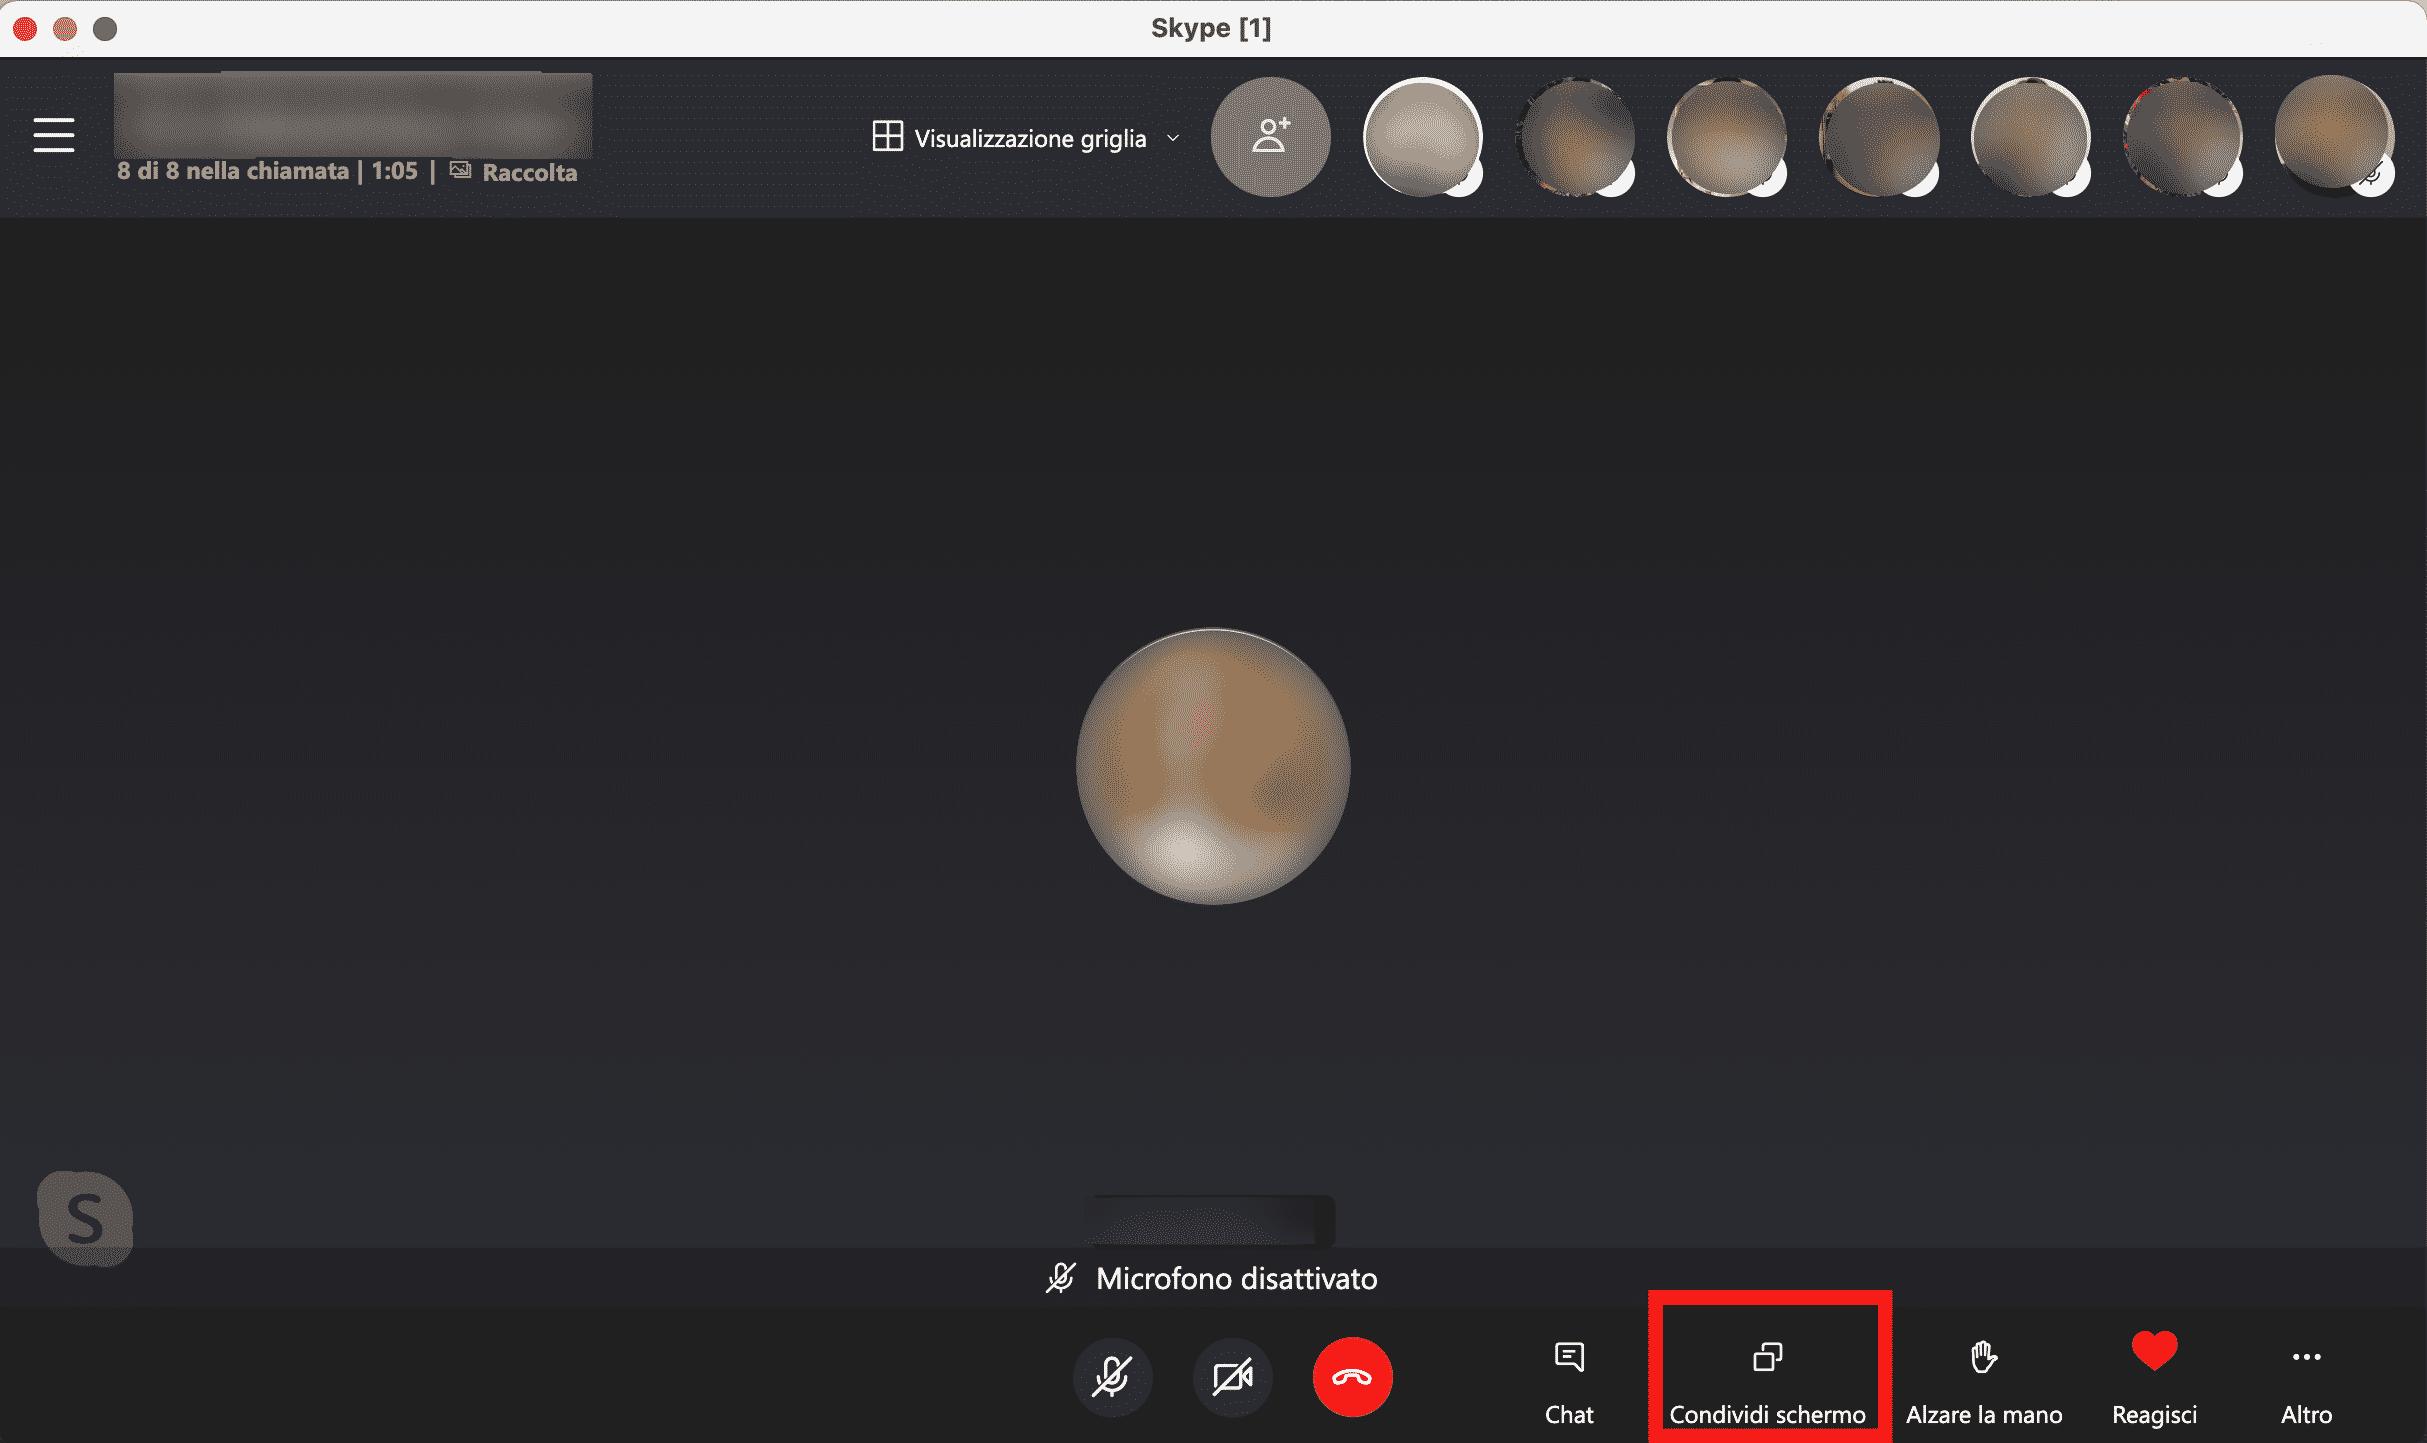 condividere-schermo-skype-desktop